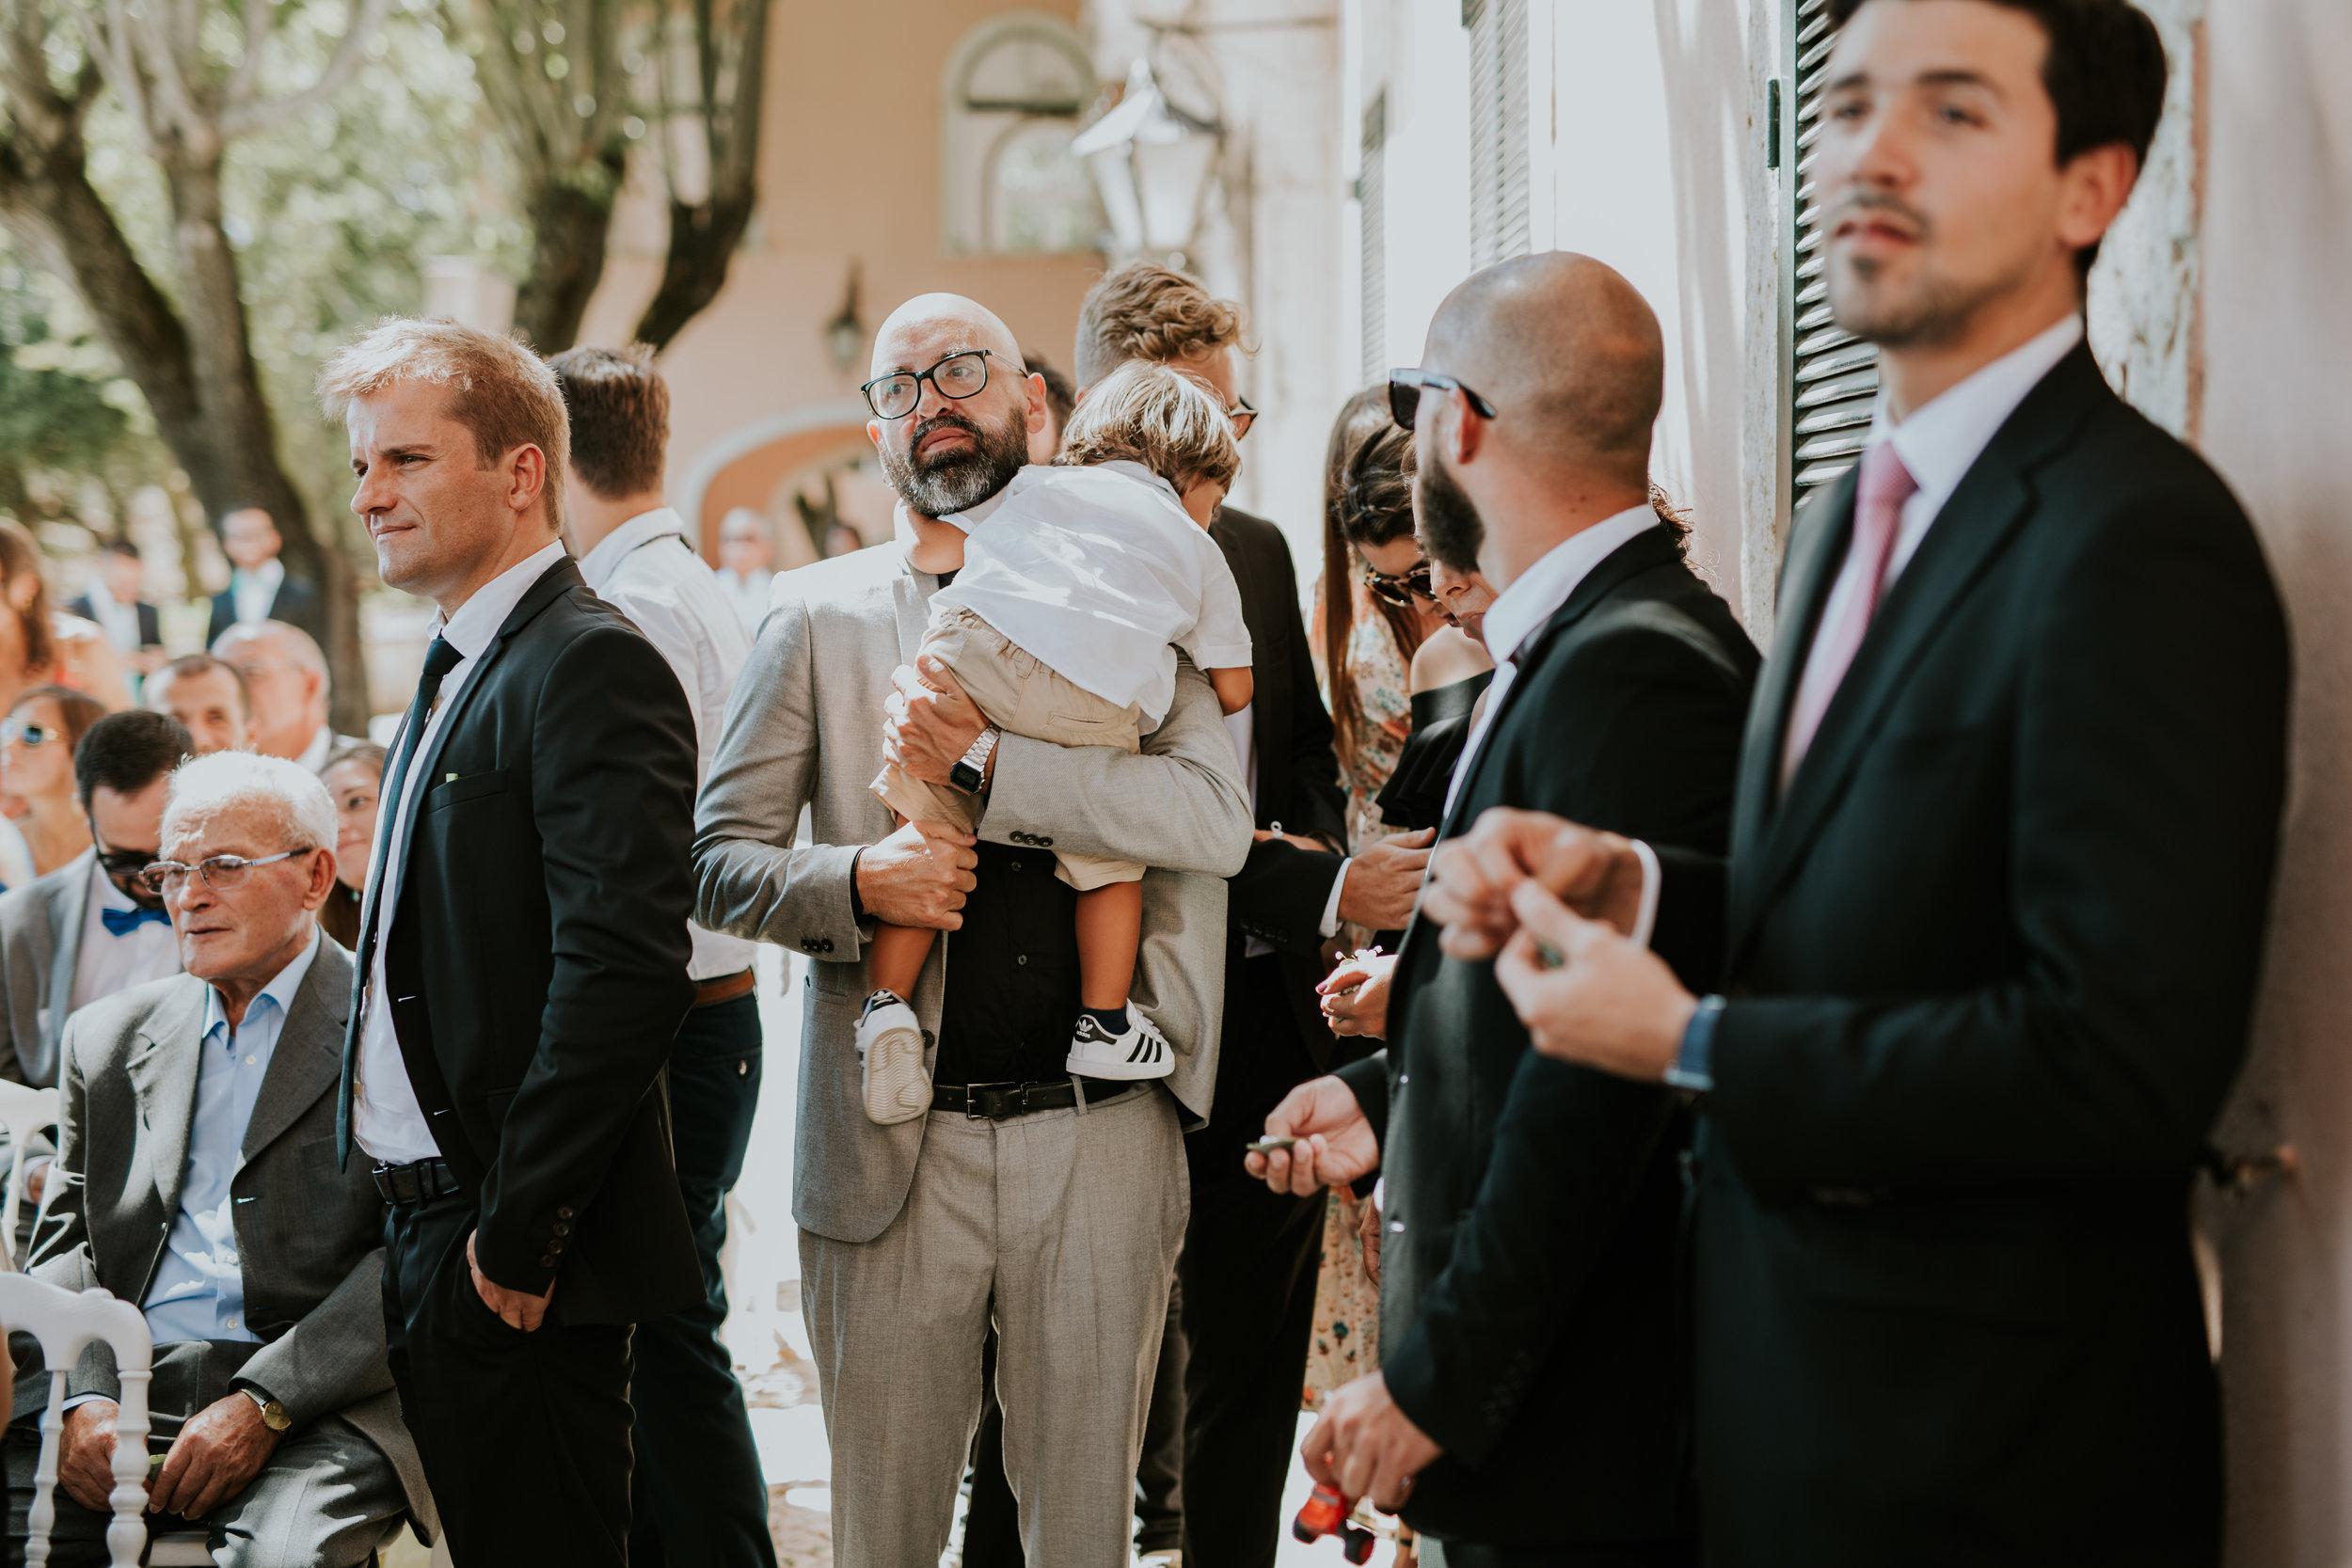 J&P 284_ 02 setembro 2017 Wedding day_.jpg